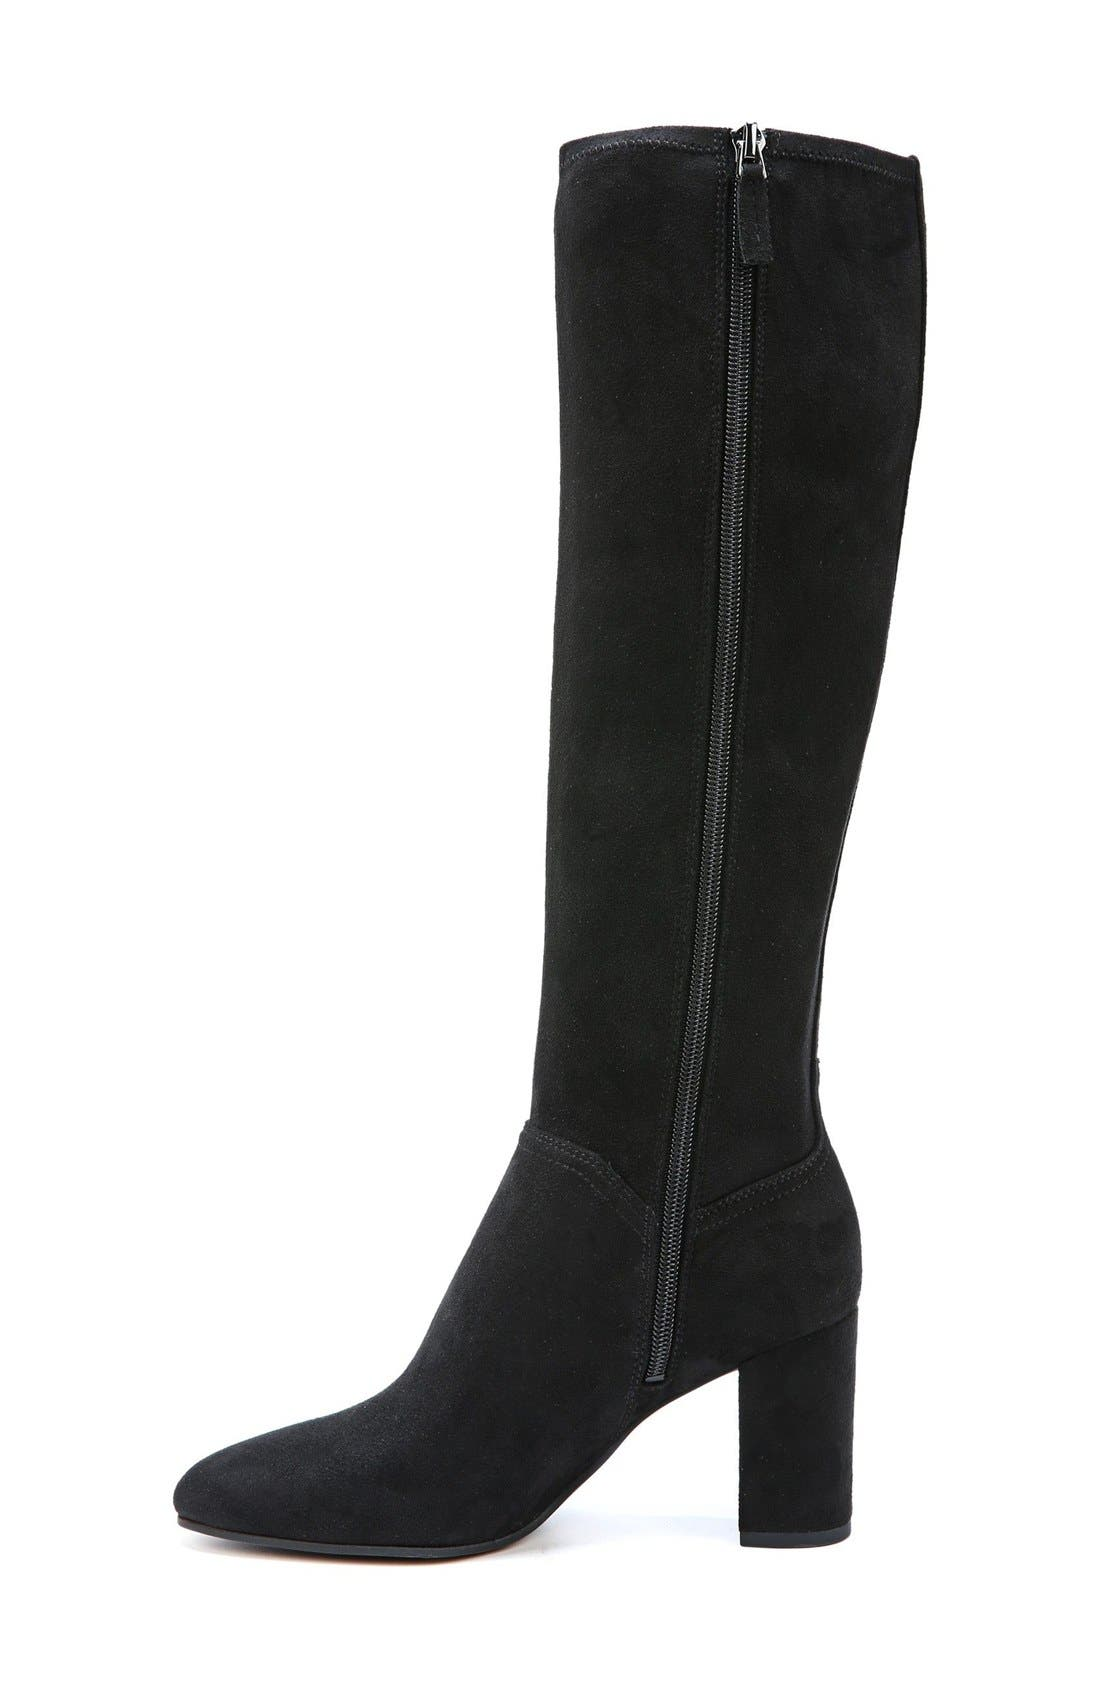 Alternate Image 2  - SARTO by Franco Sarto Effie Knee High Boot (Women)